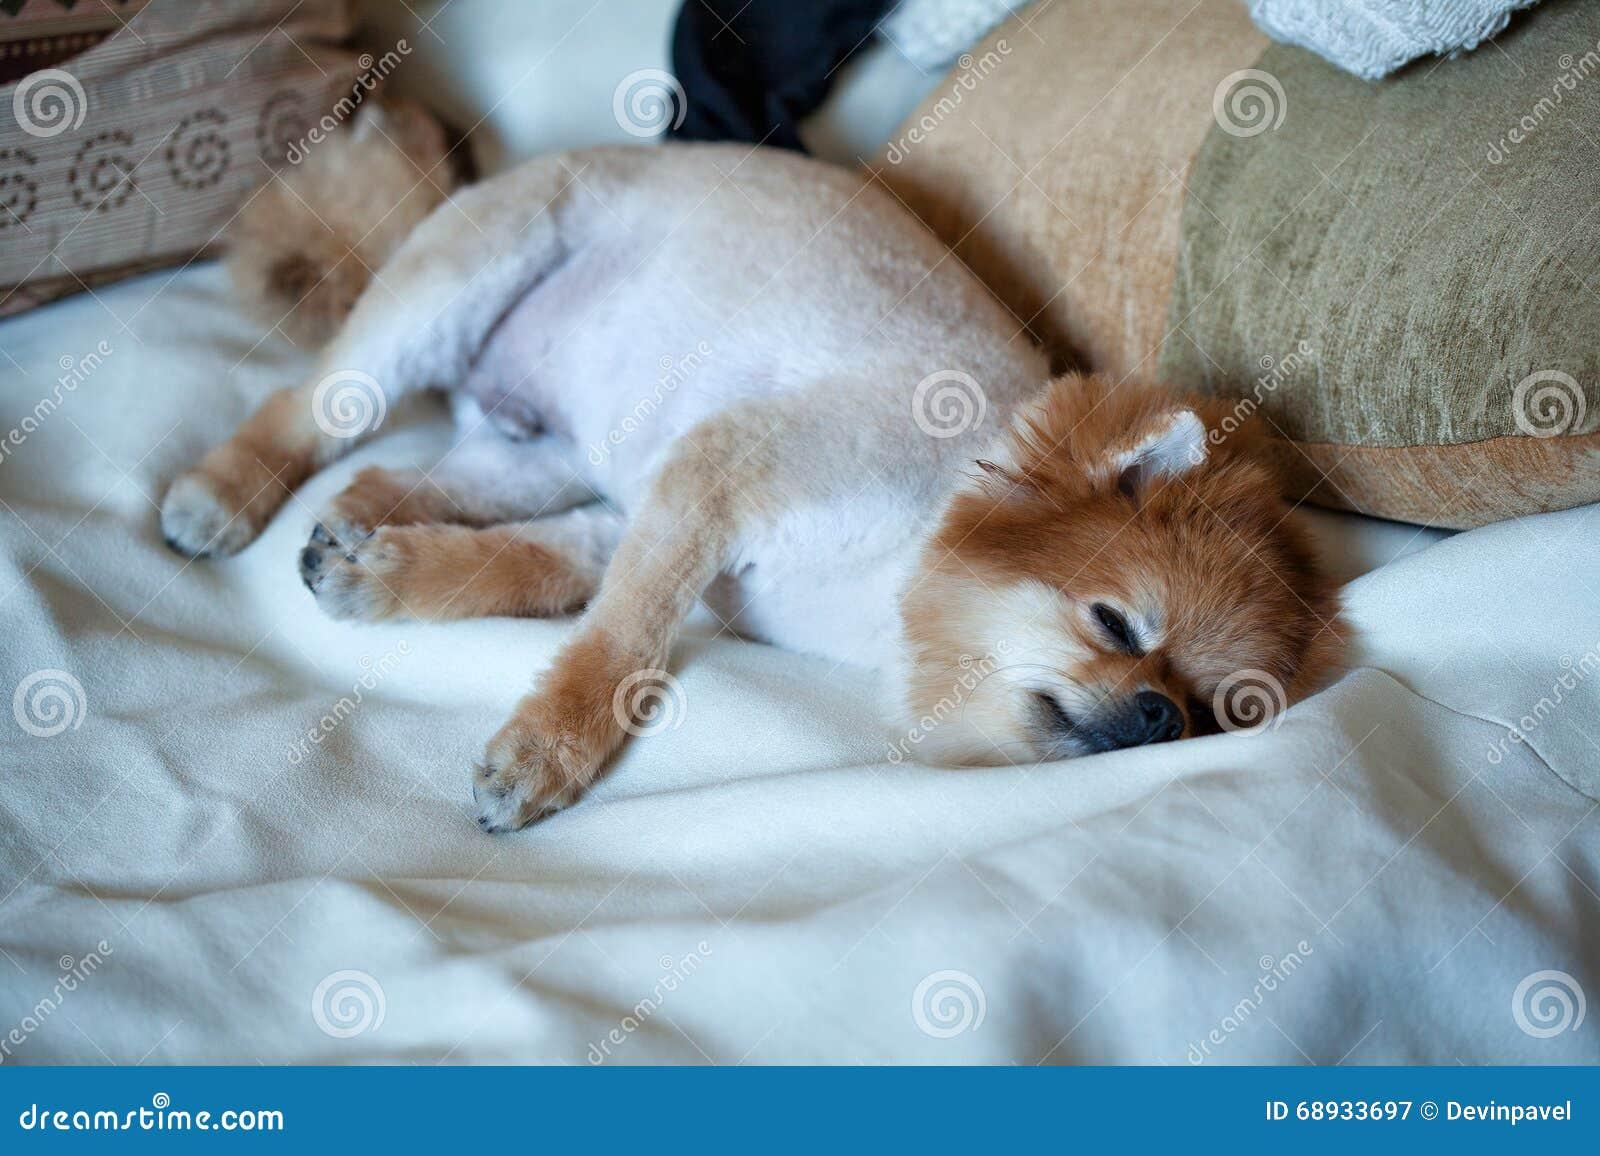 Short-haired Dog Breeds Spitz Stock Image - Image of domestic, puppy ...